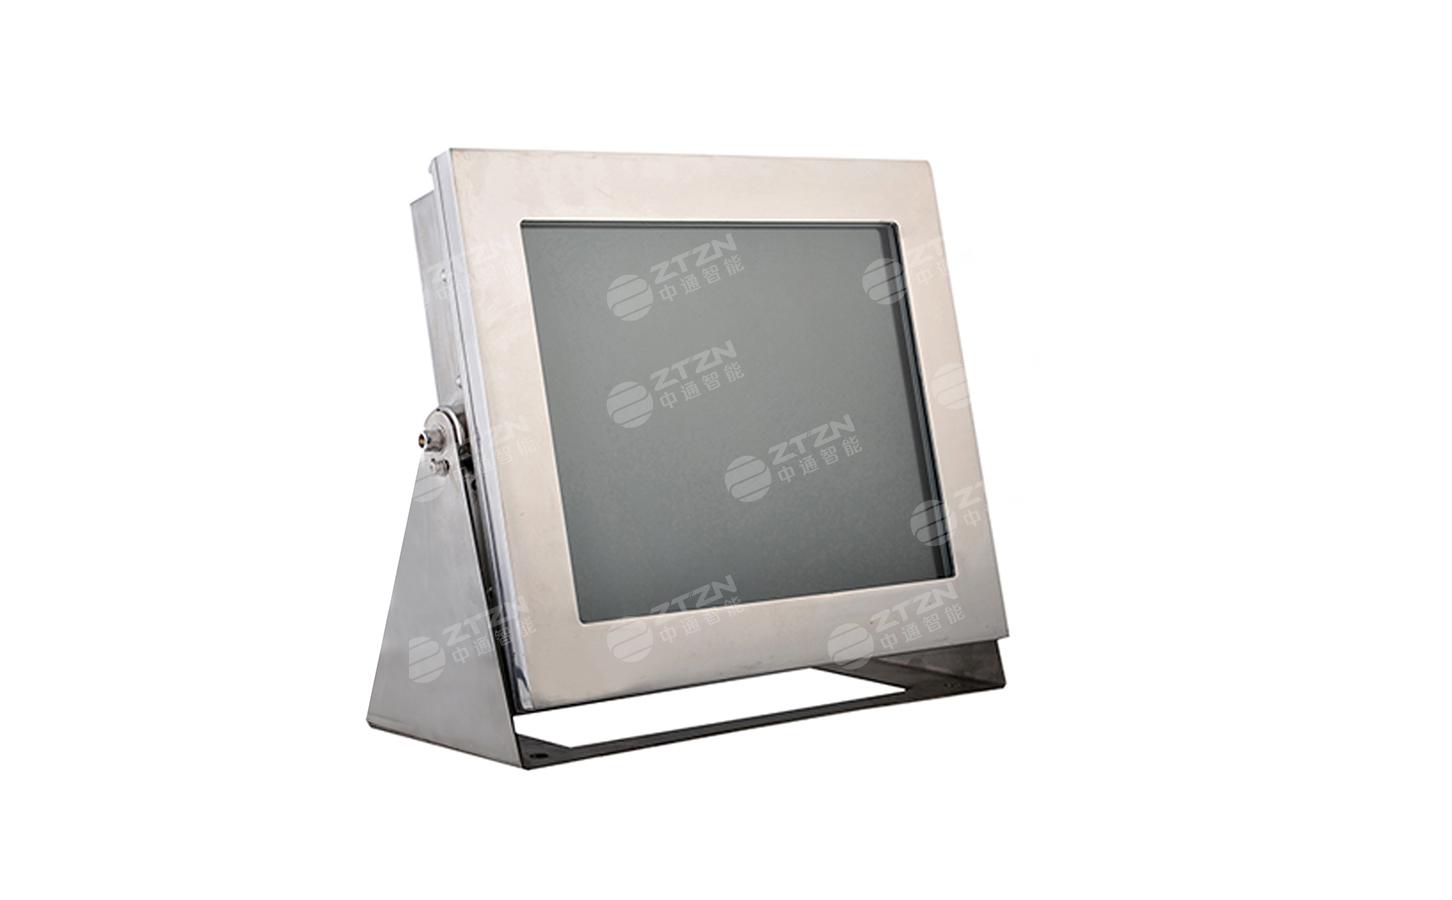 BTJ-A1防爆监视器价格,BTJ-A1防爆监视器厂家